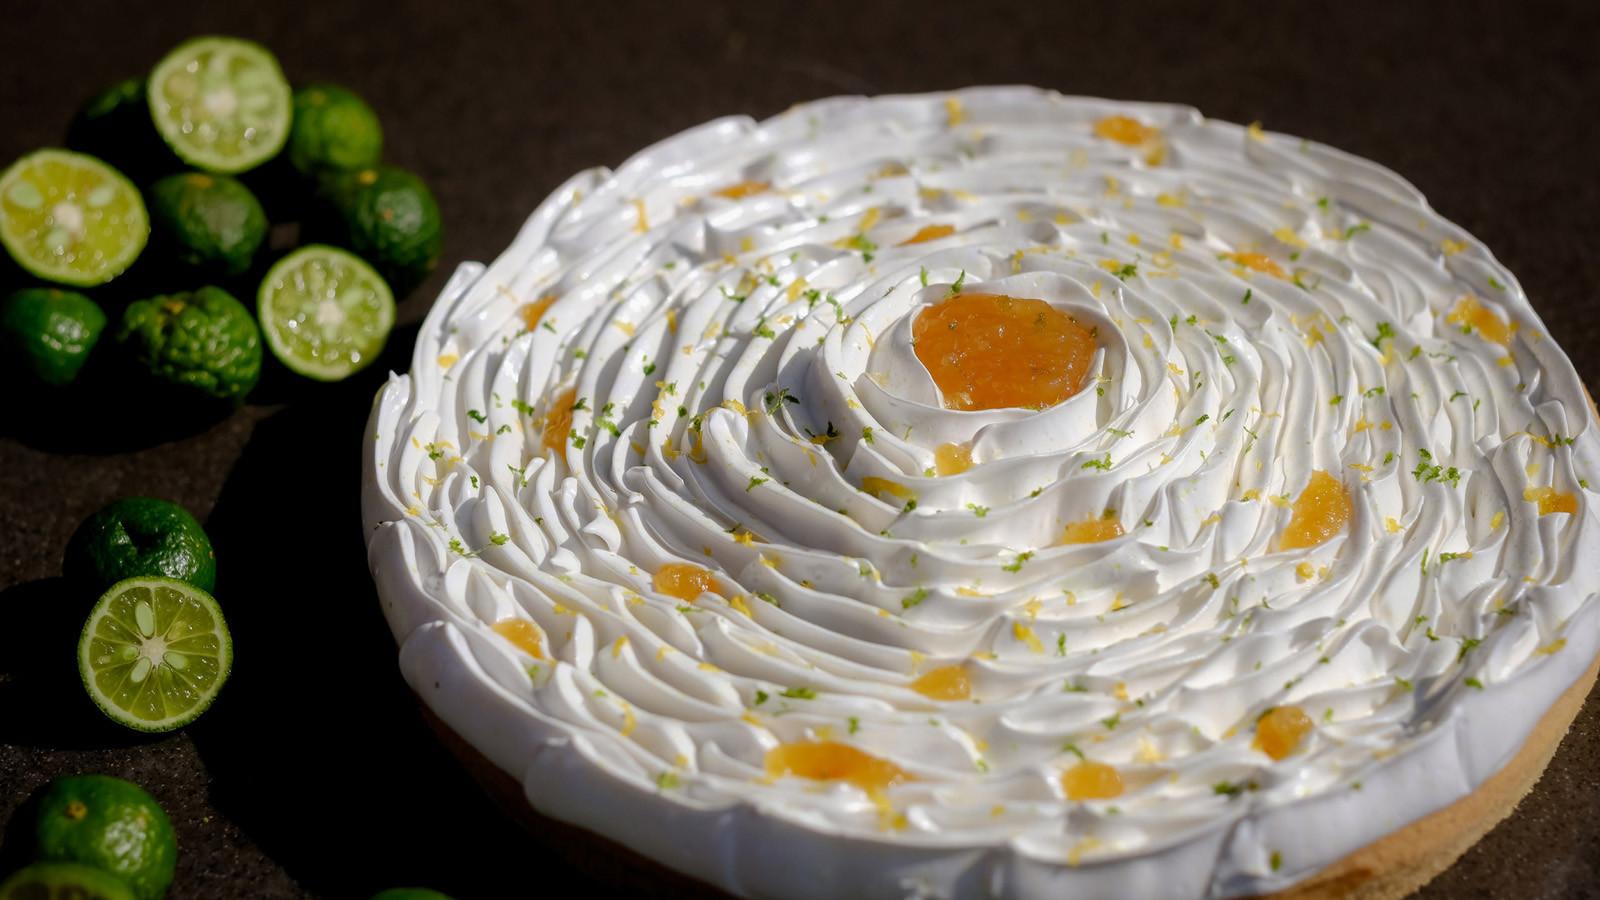 news-main-new-pastry-chef-joins-world-class-culinary-team-of-four-seasons-resort-bali-at-jimbaran-bay.1611748722.jpg